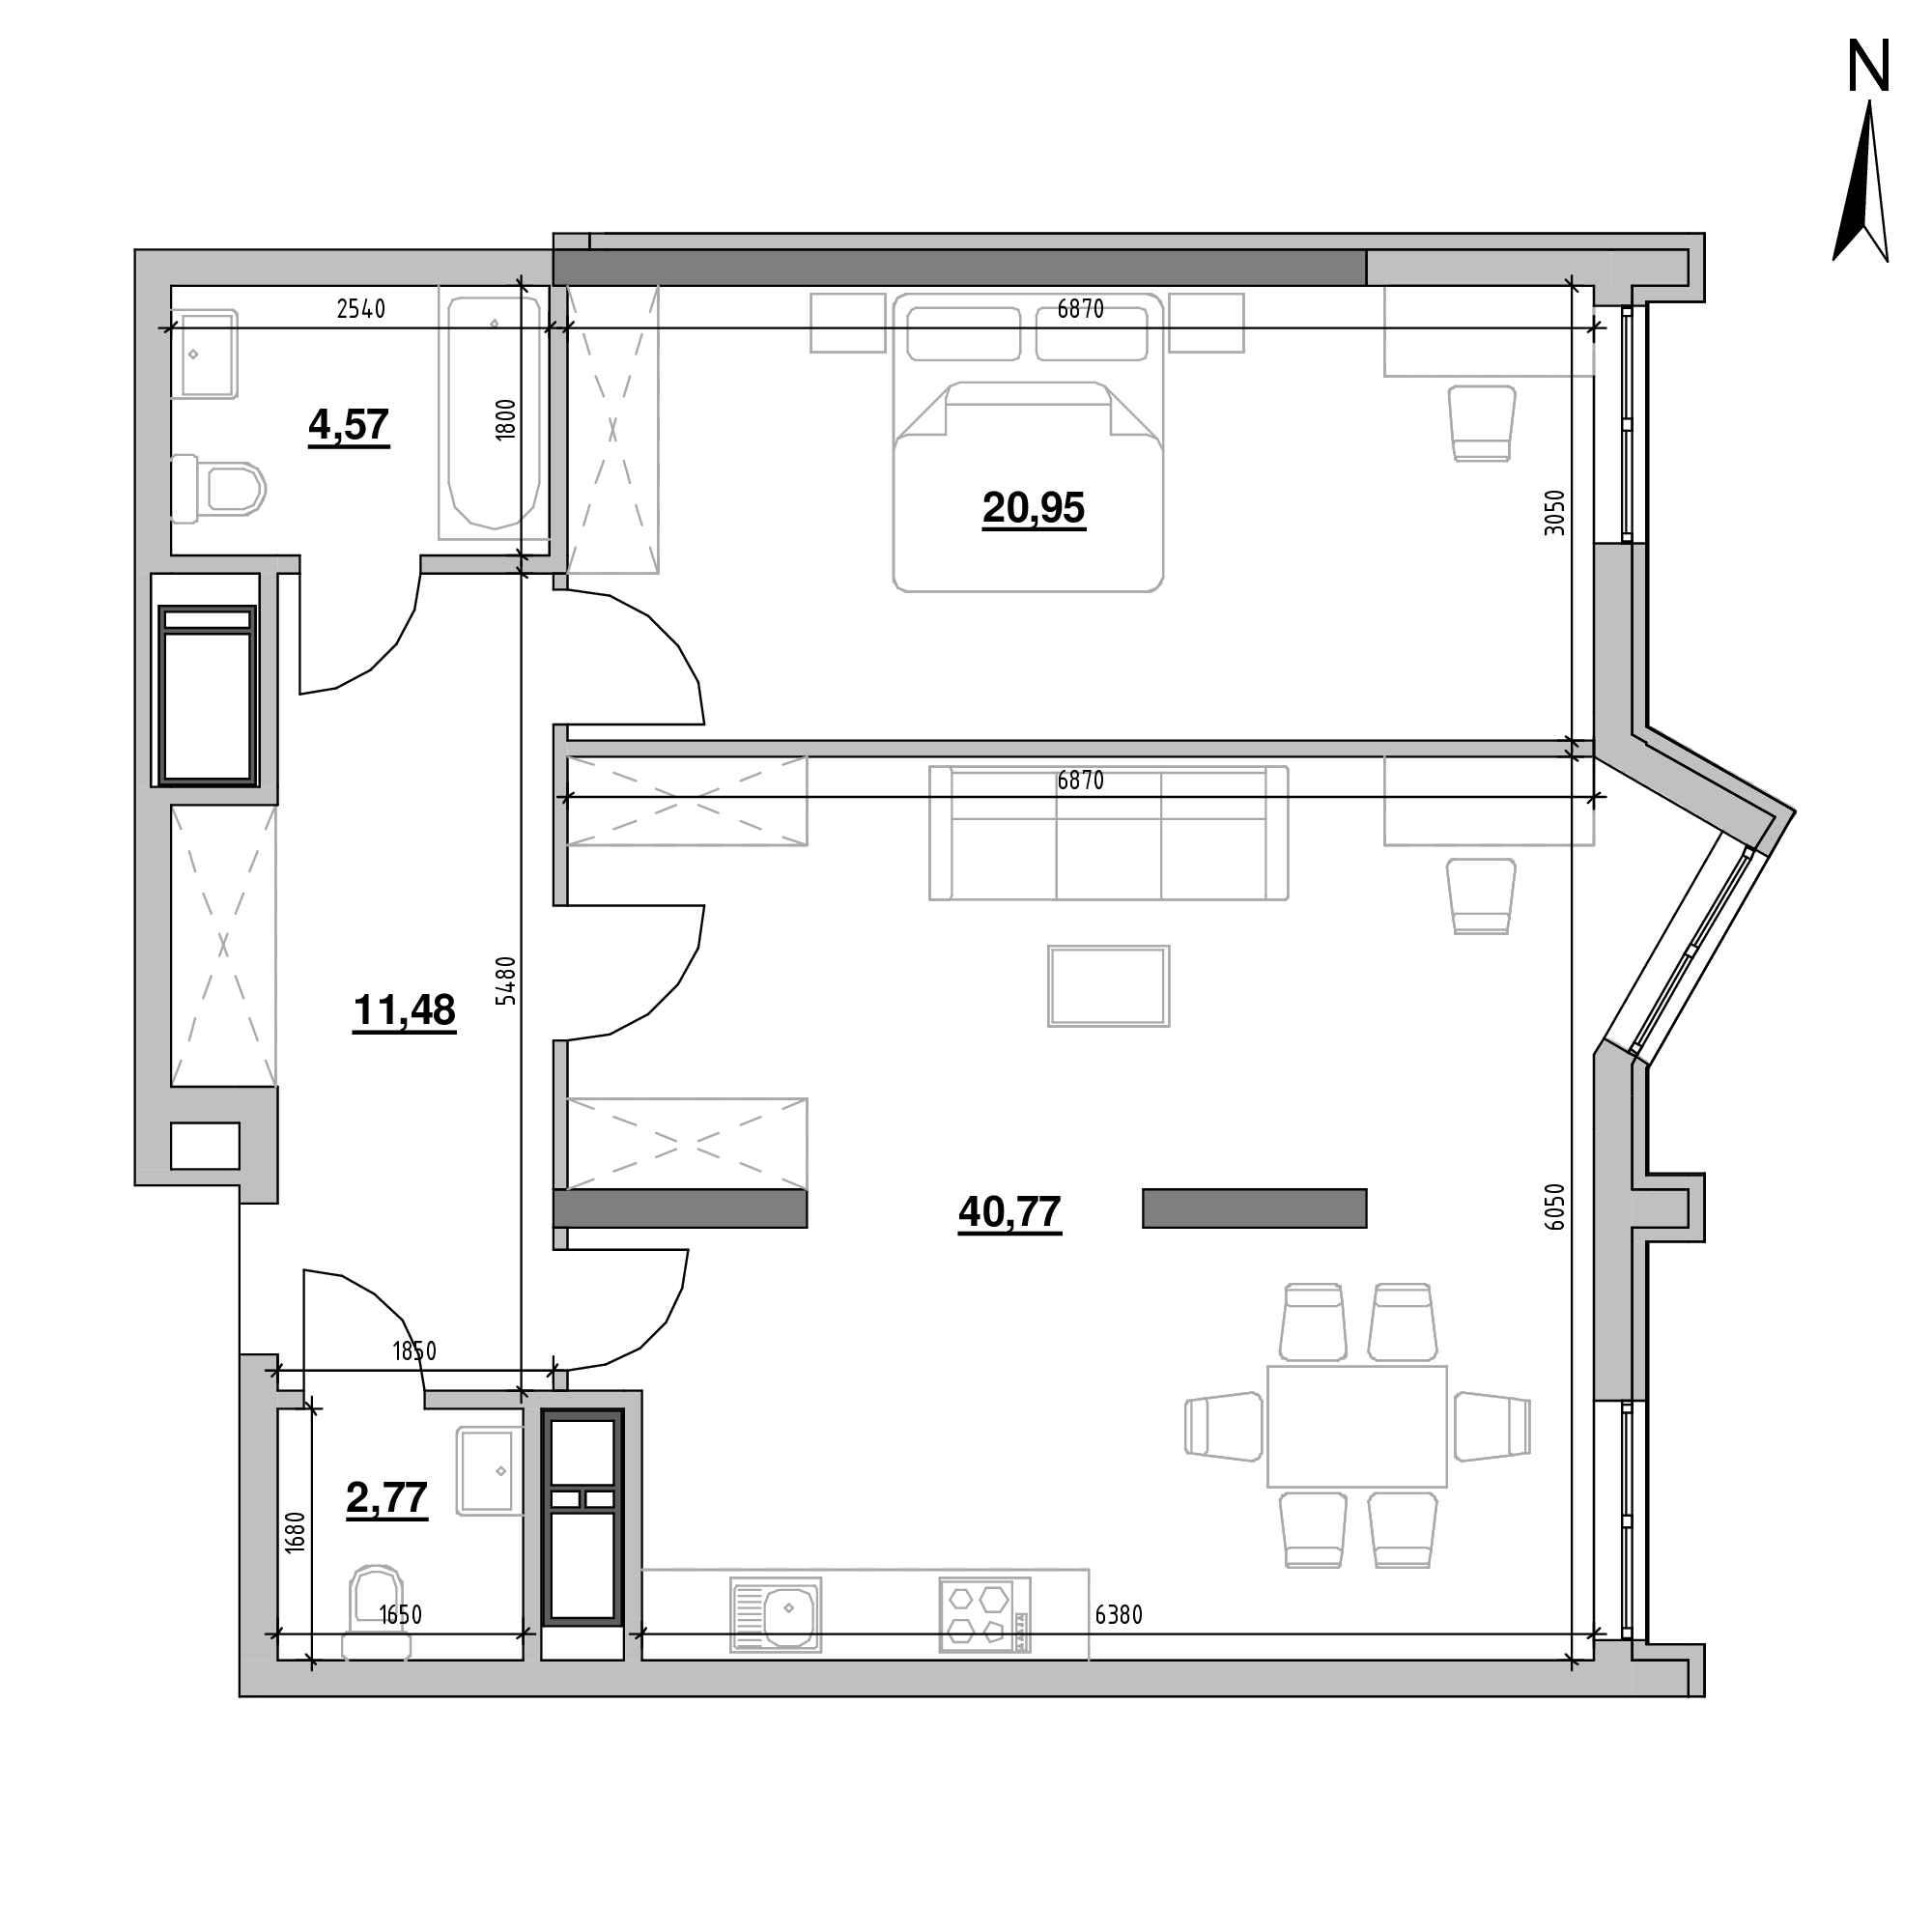 ЖК Nordica Residence: планування 1-кімнатної квартири, №17, 80.54 м<sup>2</sup>